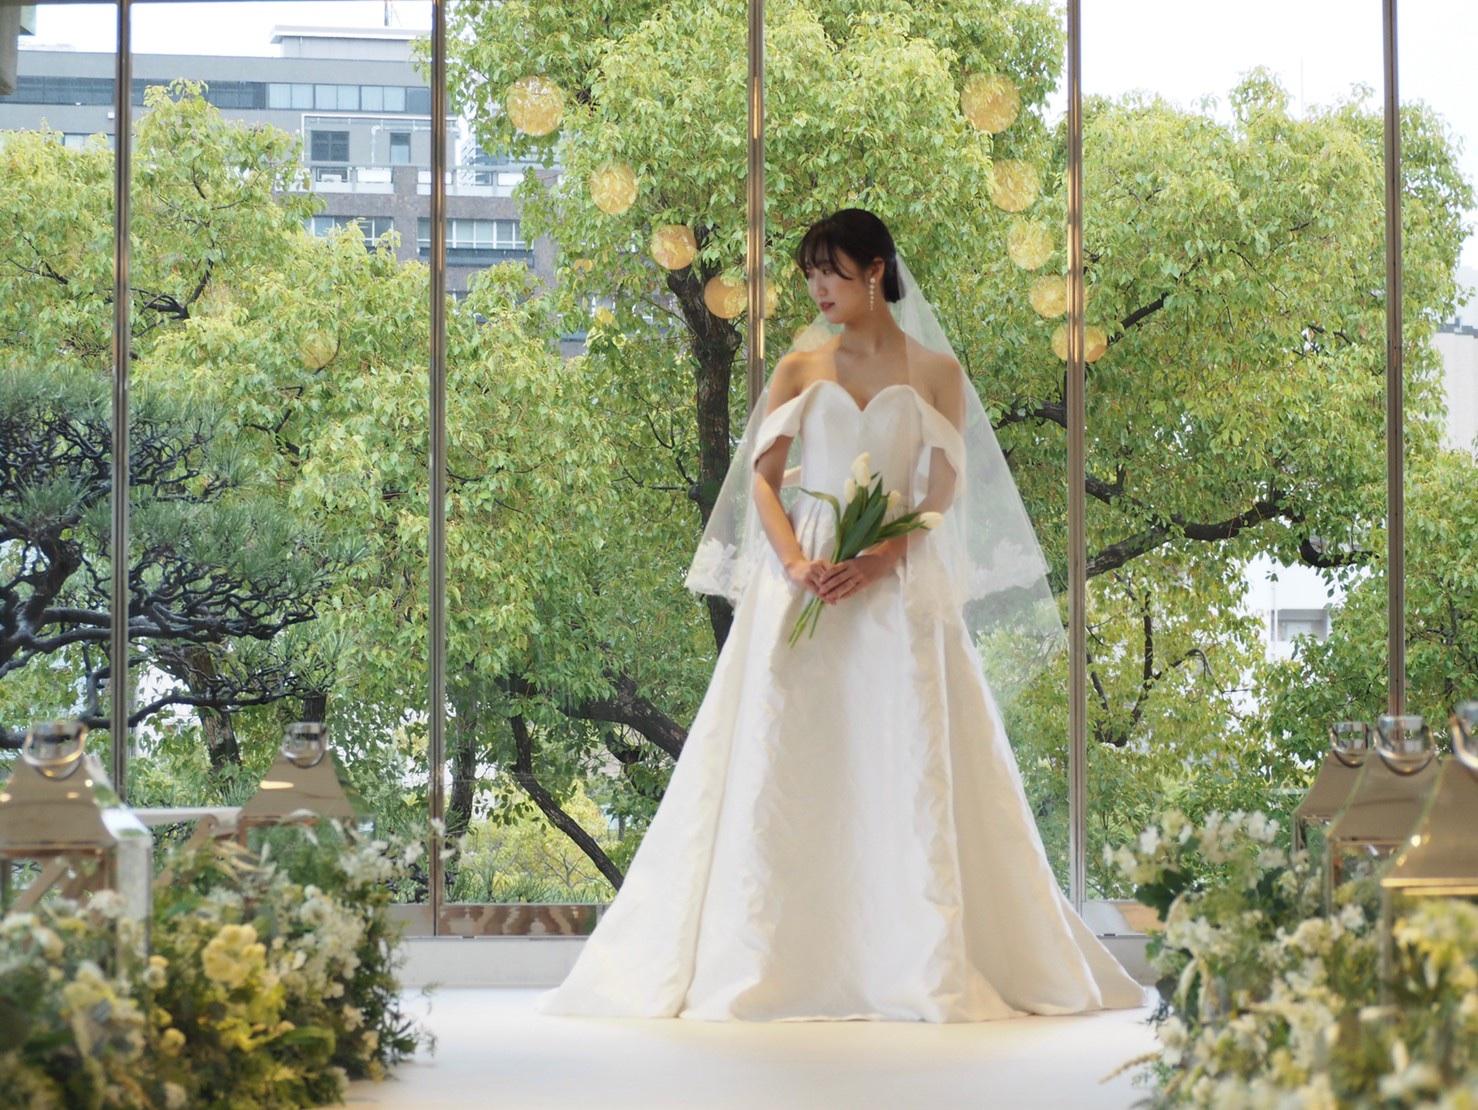 THE TREAT DRESSING神戸店にてお取り扱いのある相楽園のチャペルにぴったりなキャロリーナ・ヘレラのオフショルダーウェディングドレス